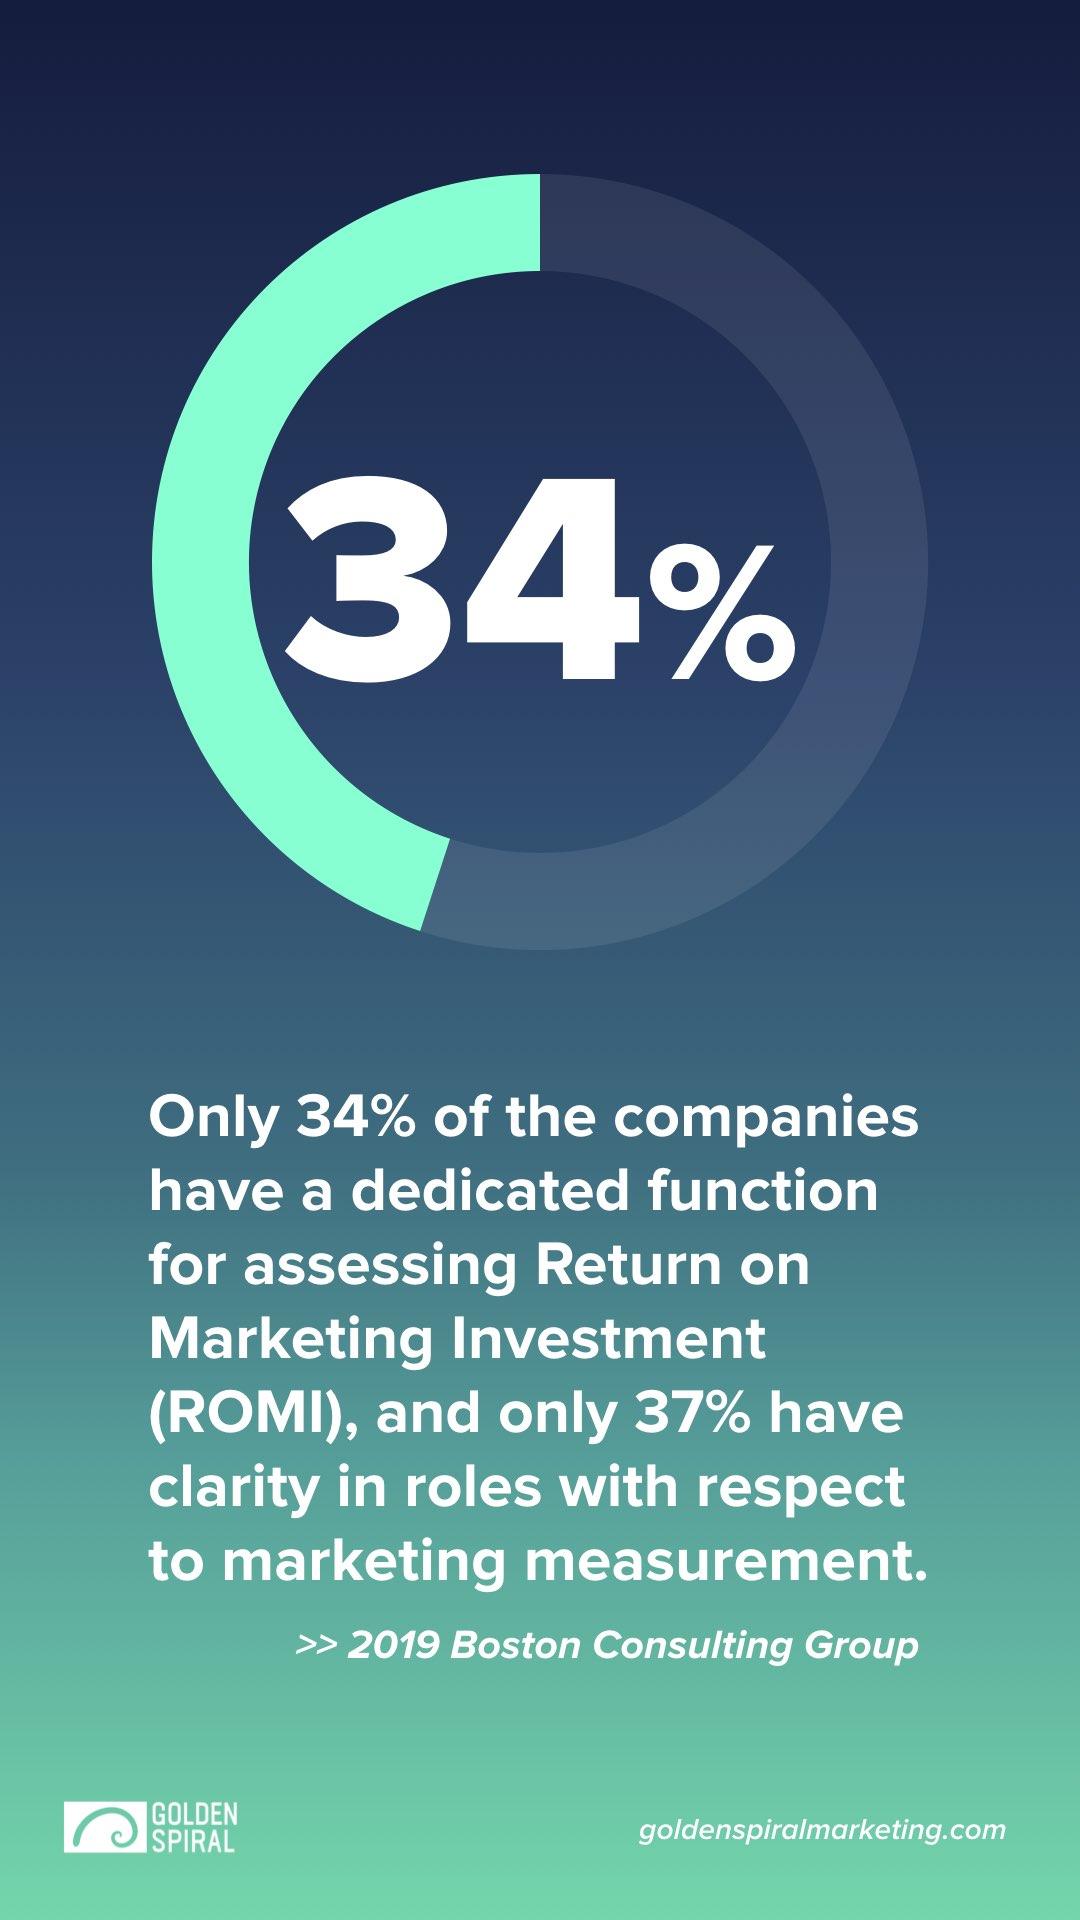 return on marketing investment statistic